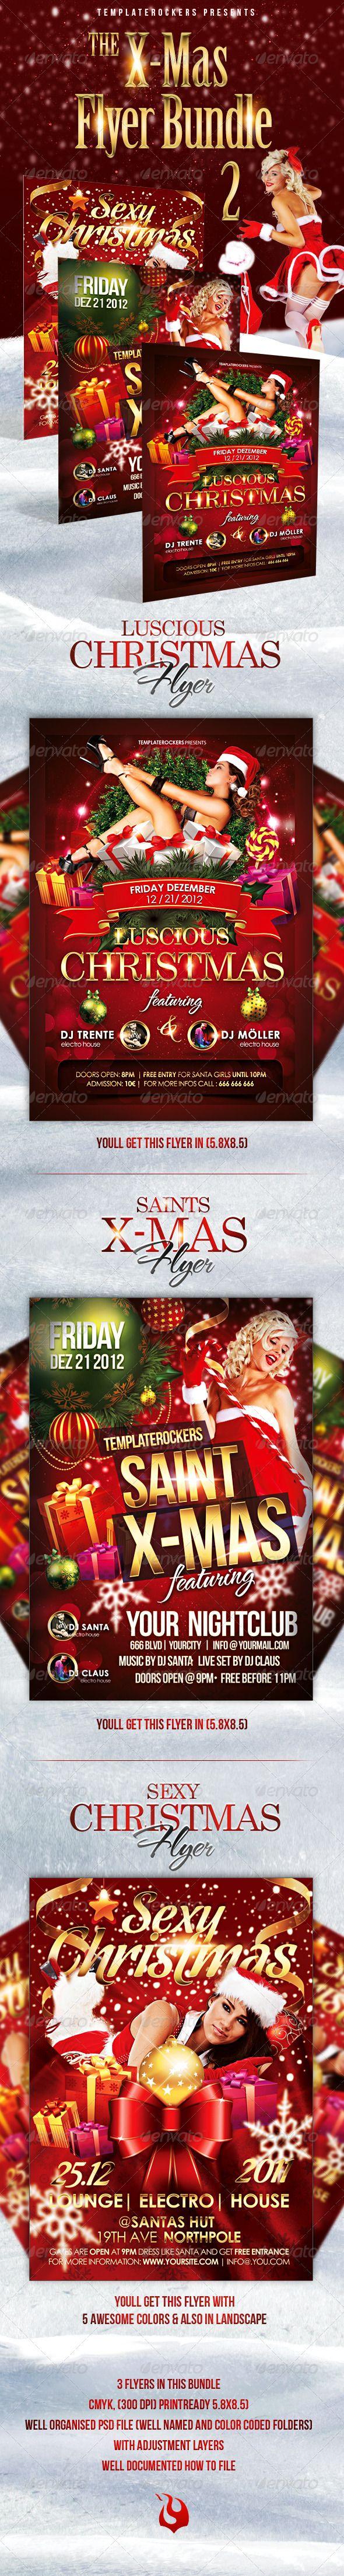 The X Mas Flyer Bundle 2 Incl 3 Flyers Pinterest Christmas